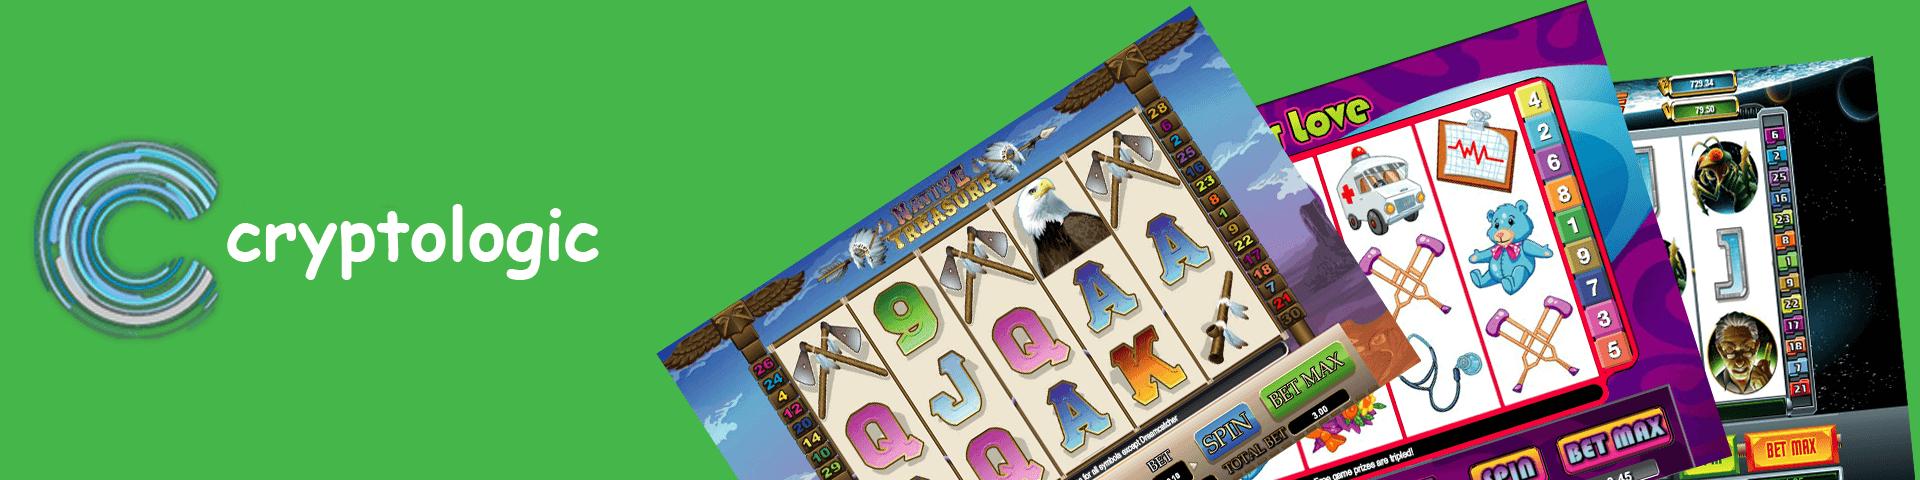 jocuri-casino-Cryptologic-multabafta-slider